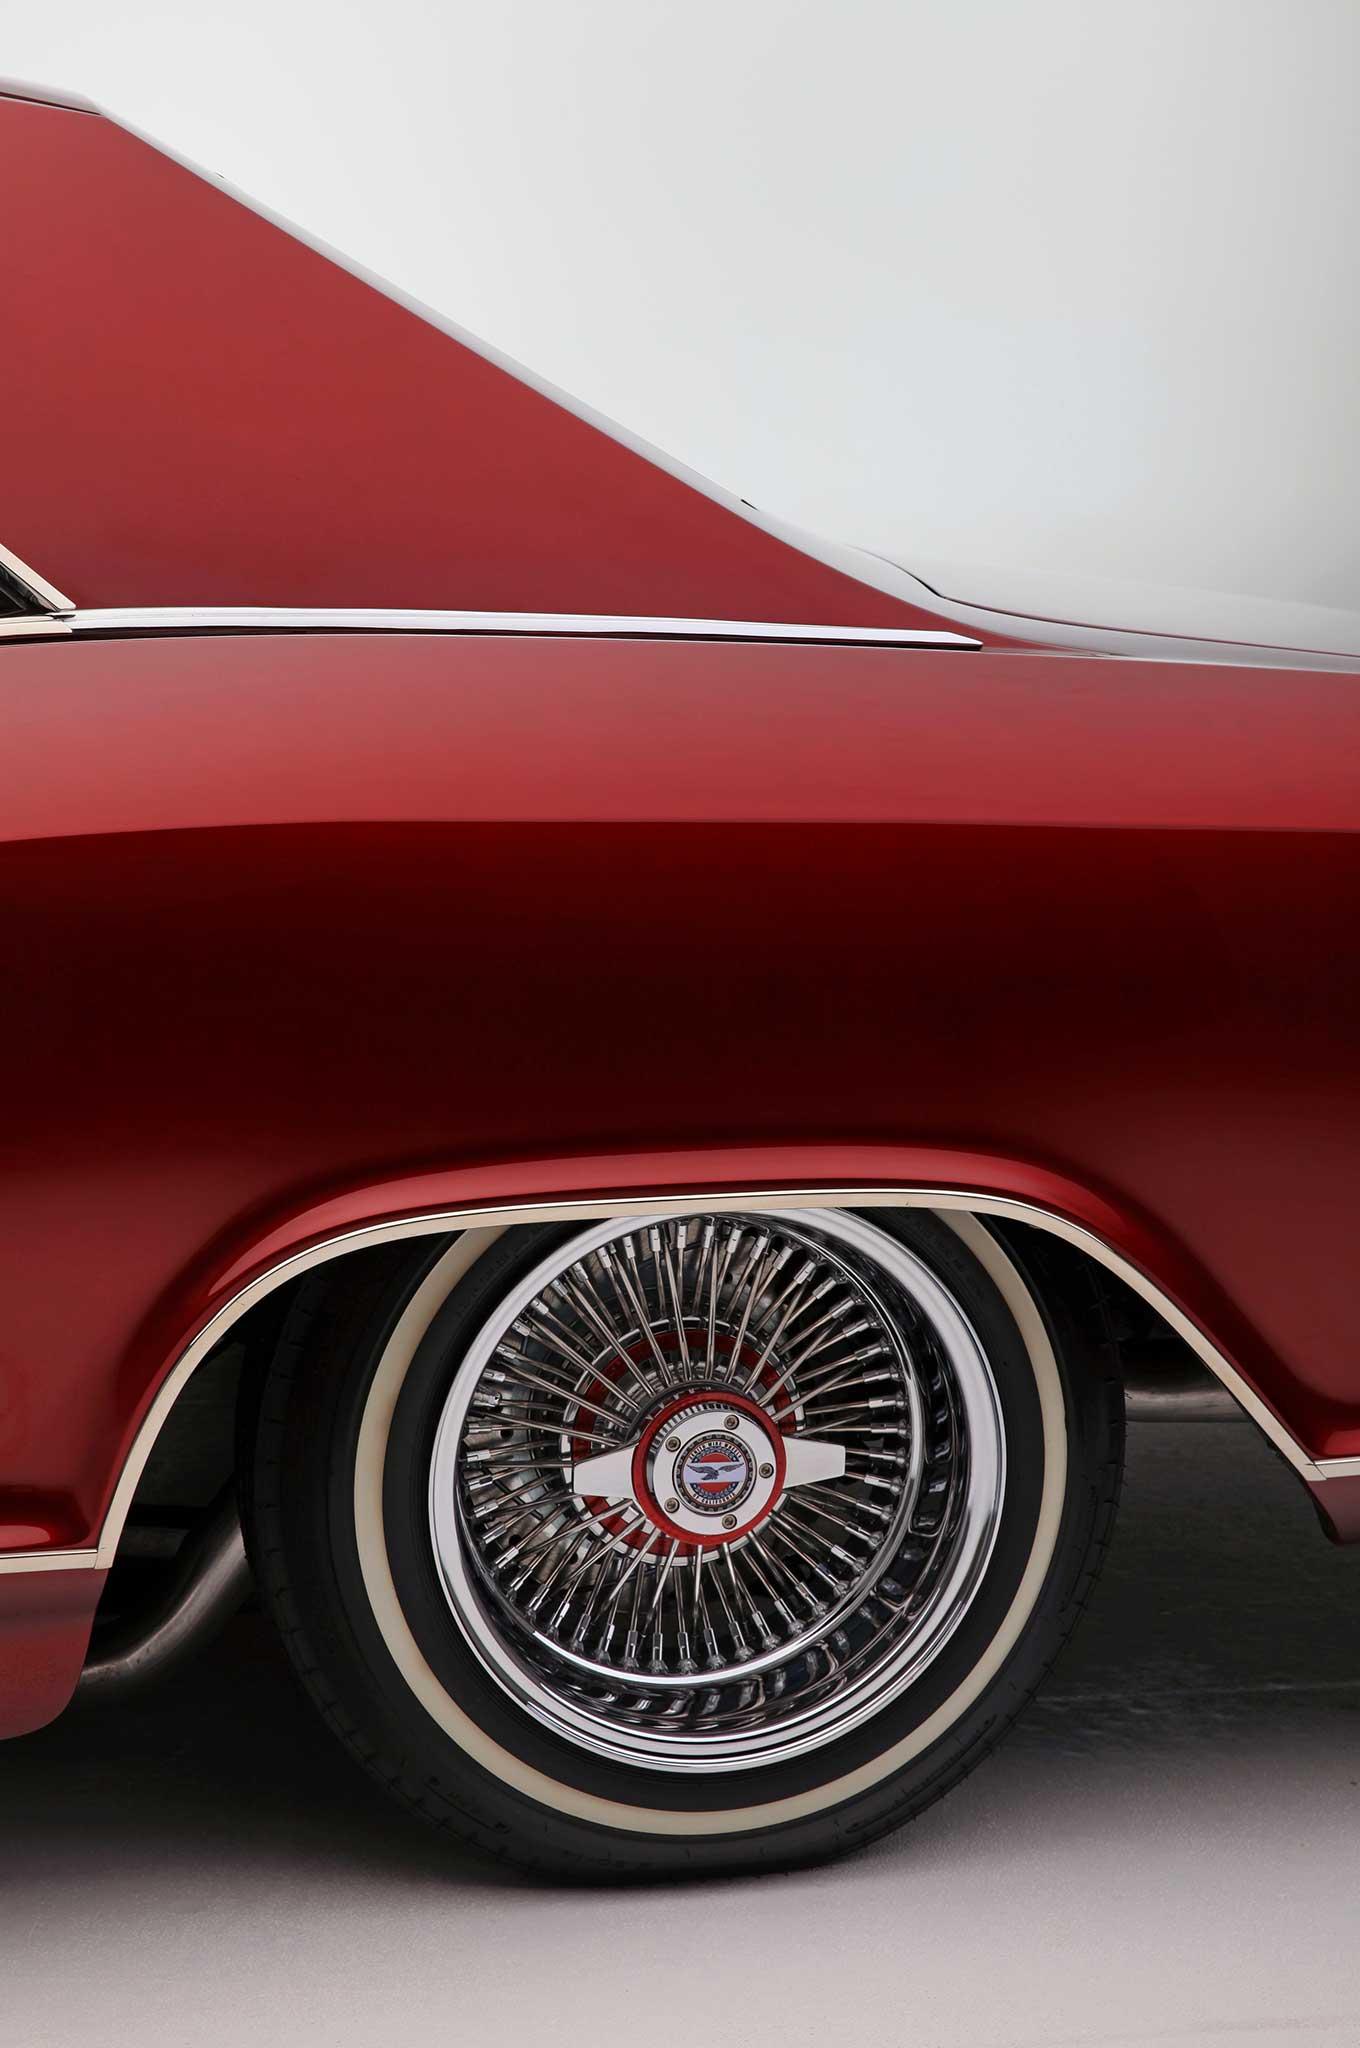 riviera buick wheels 1965 lowrider wire zenith notch custom rims wheel cars clean chrome st